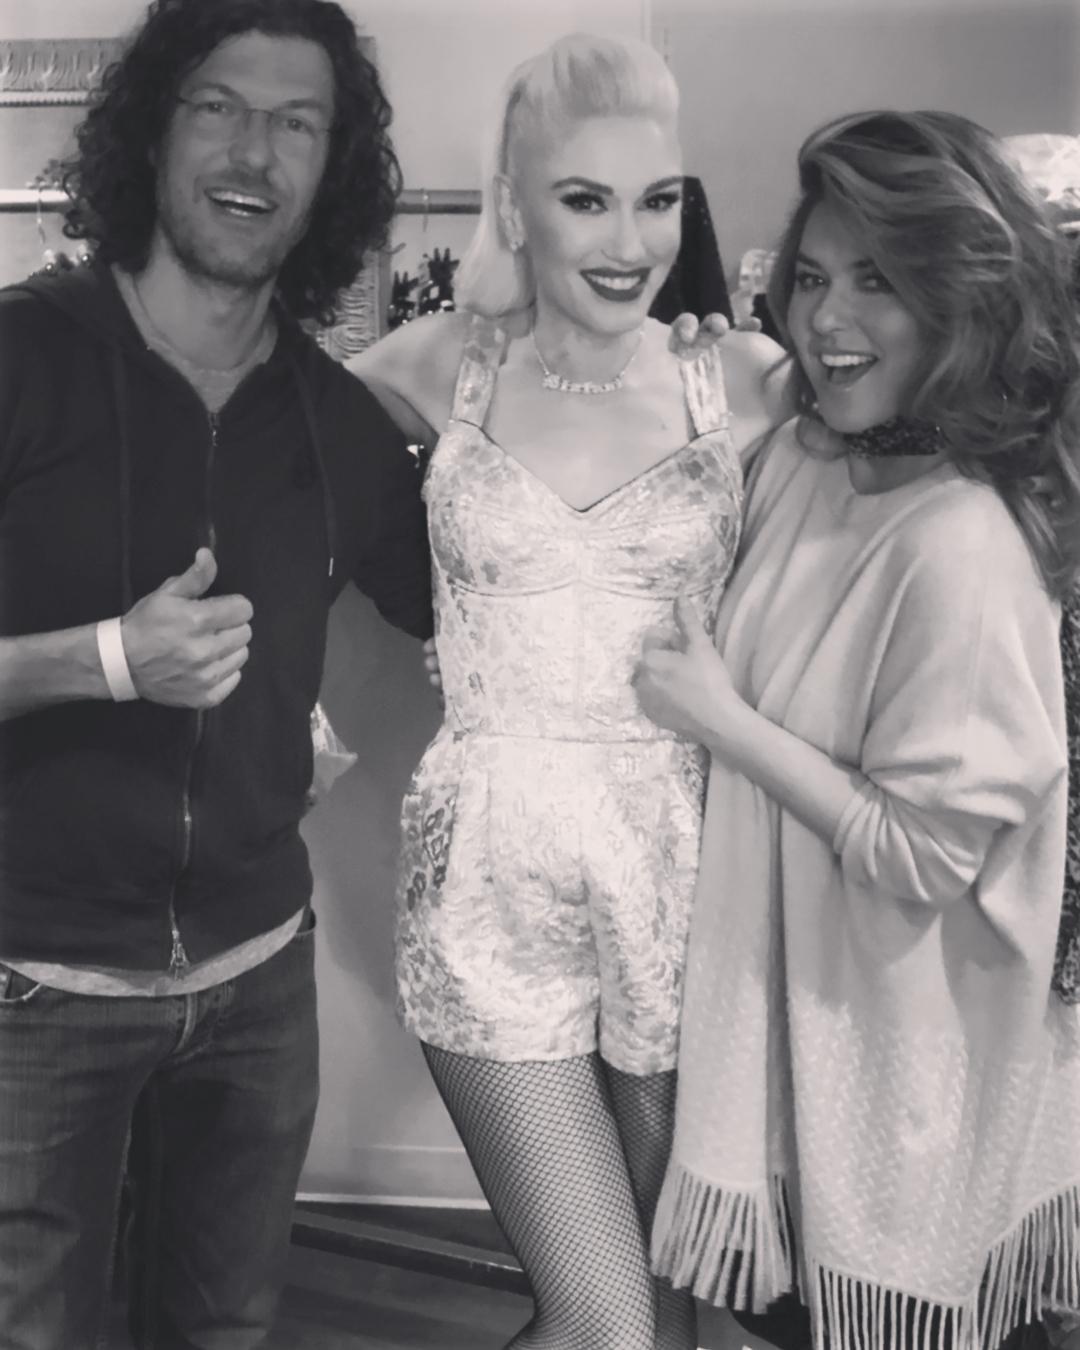 bf462cfddd Gx - 1 2    Shania attended Gwen Stefani s